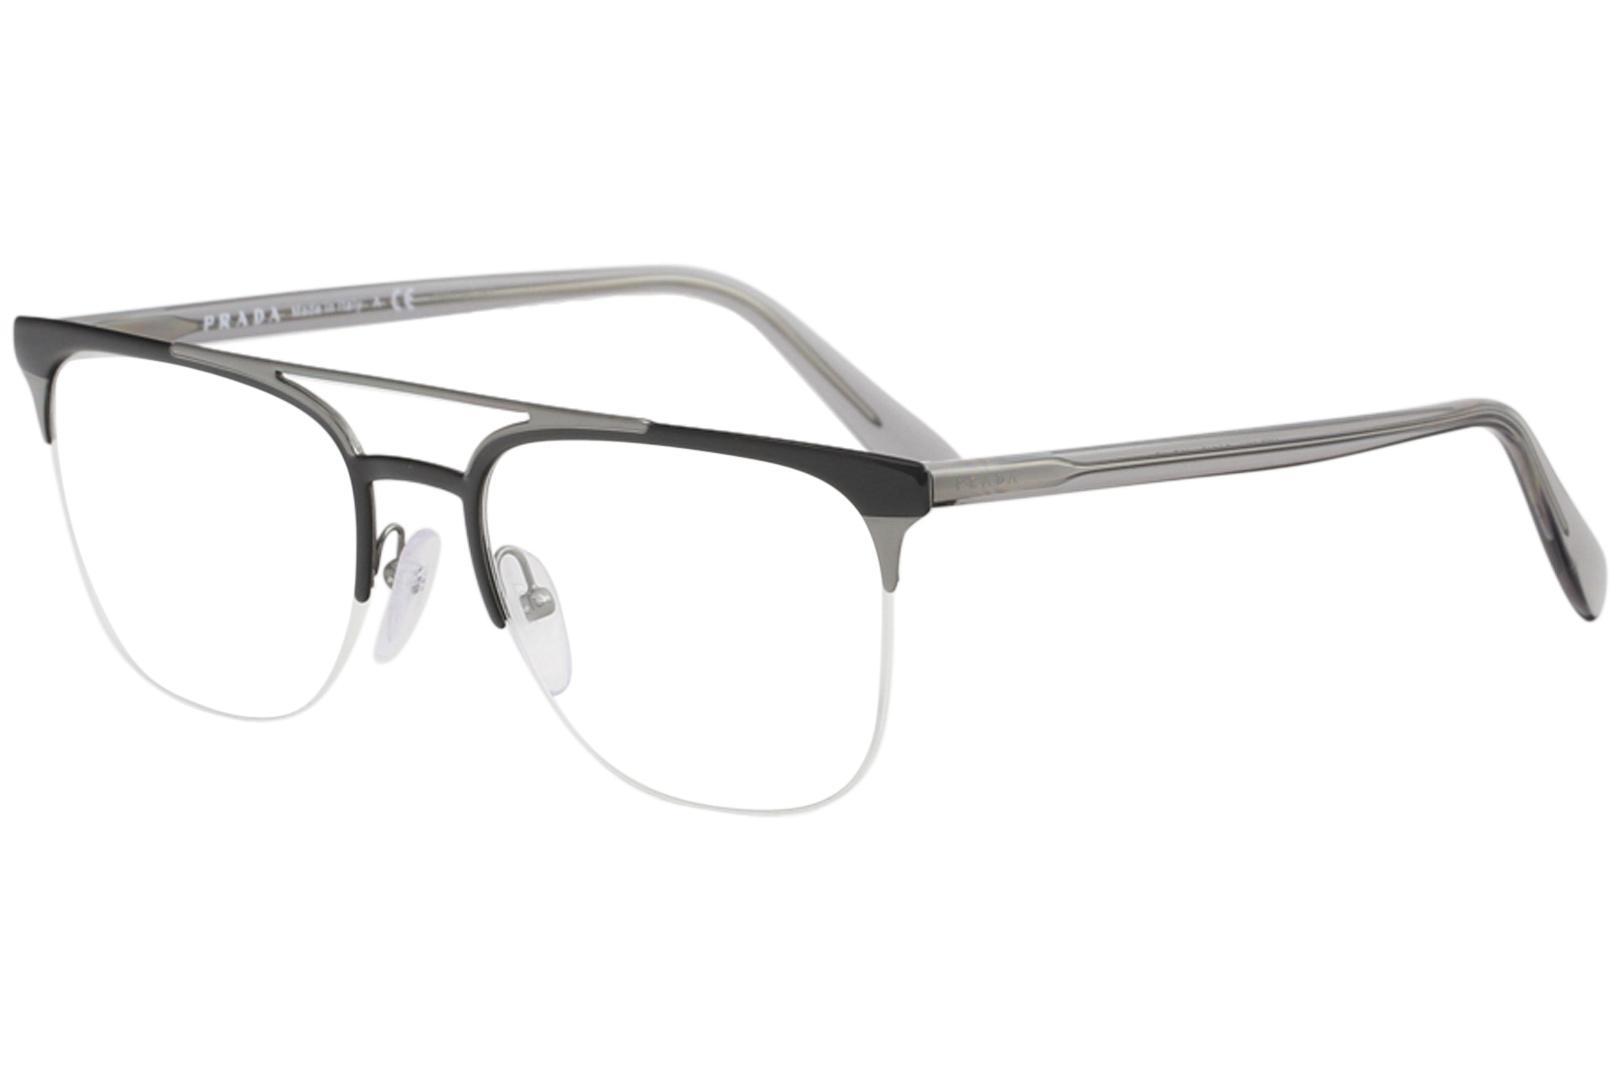 67ad1a88104 Prada Men s Eyeglasses VPR63U VPR 63U Half Rim Optical Frame by Prada